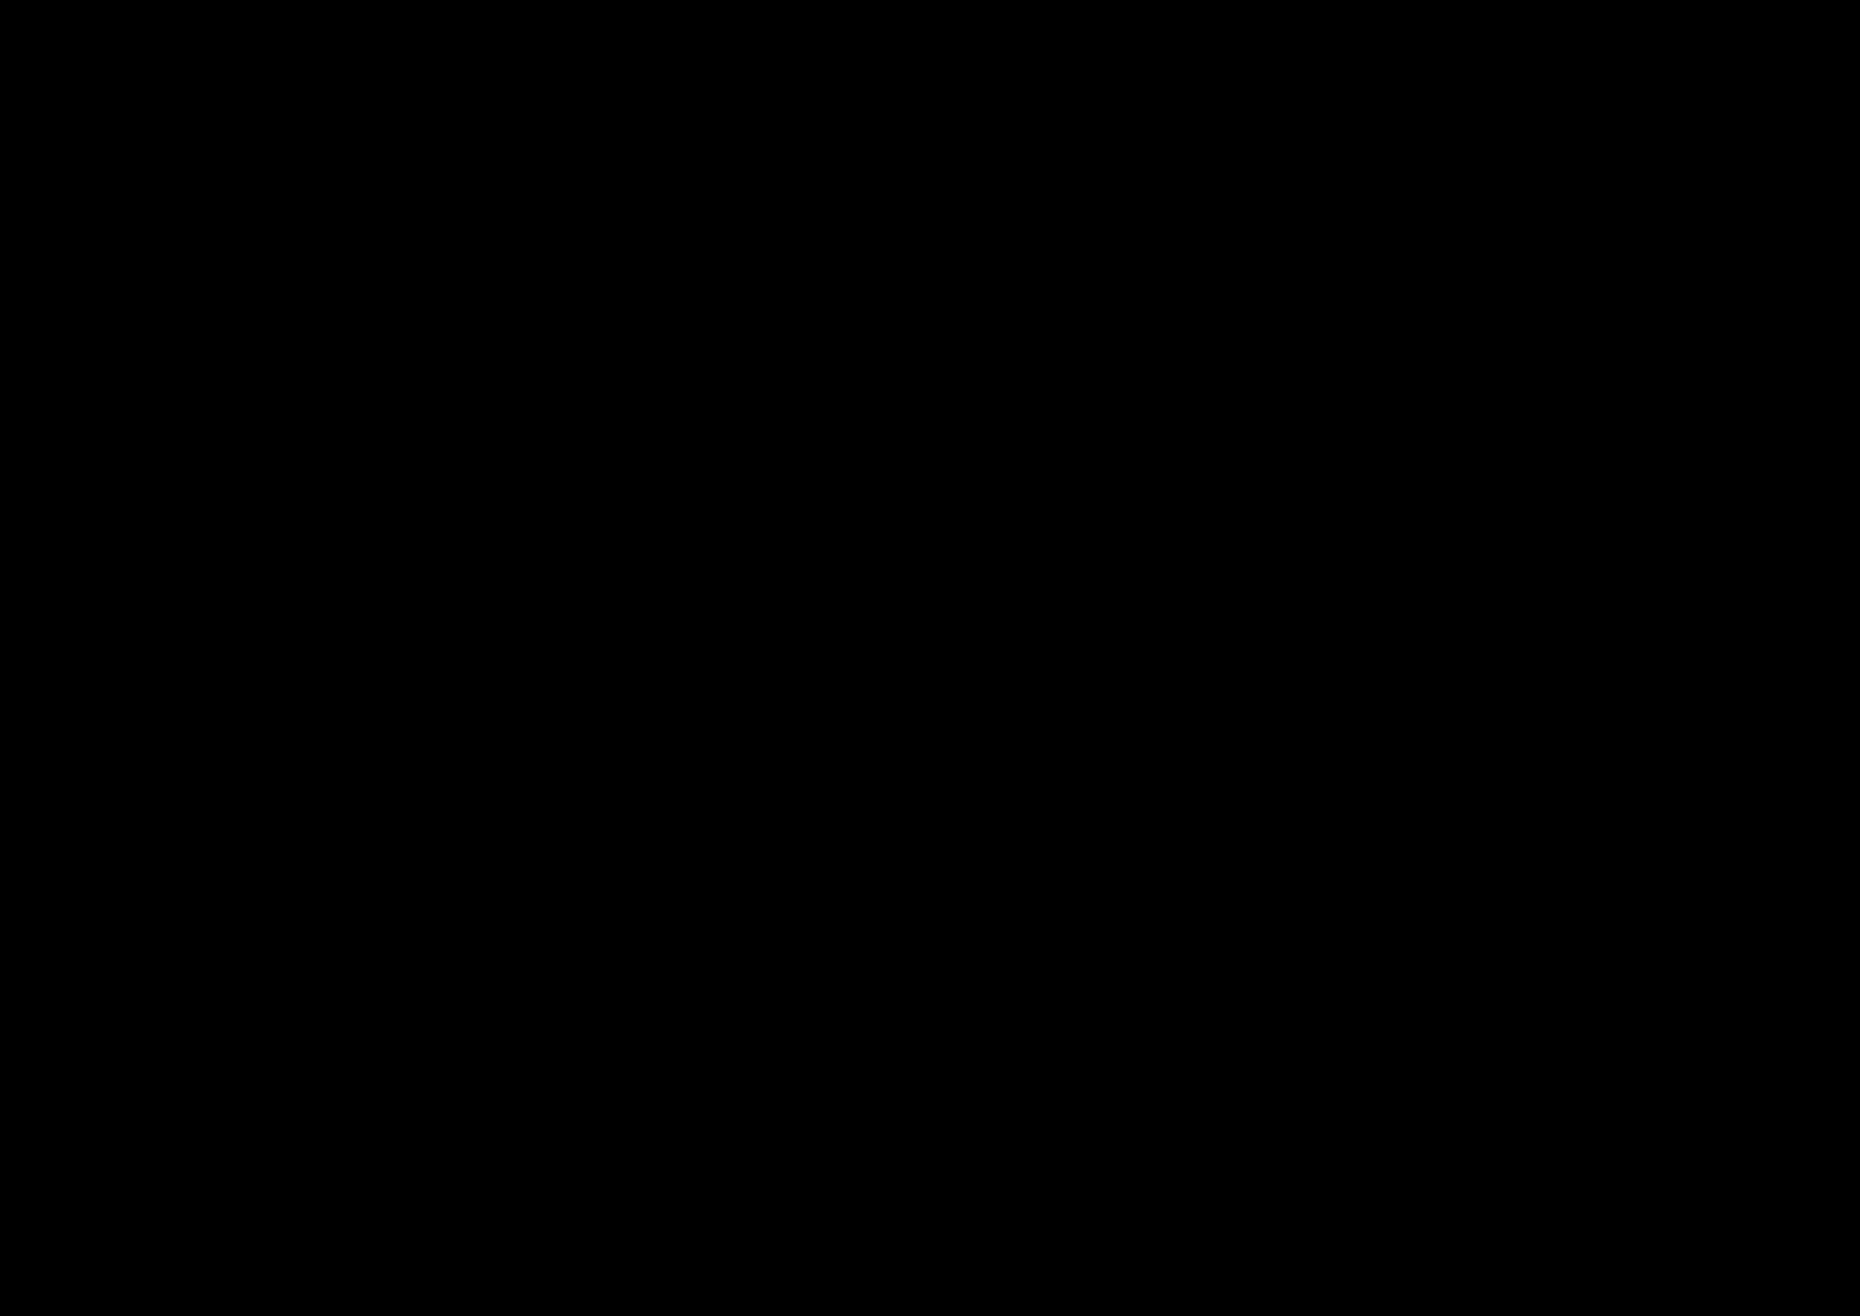 Nibiru gamers